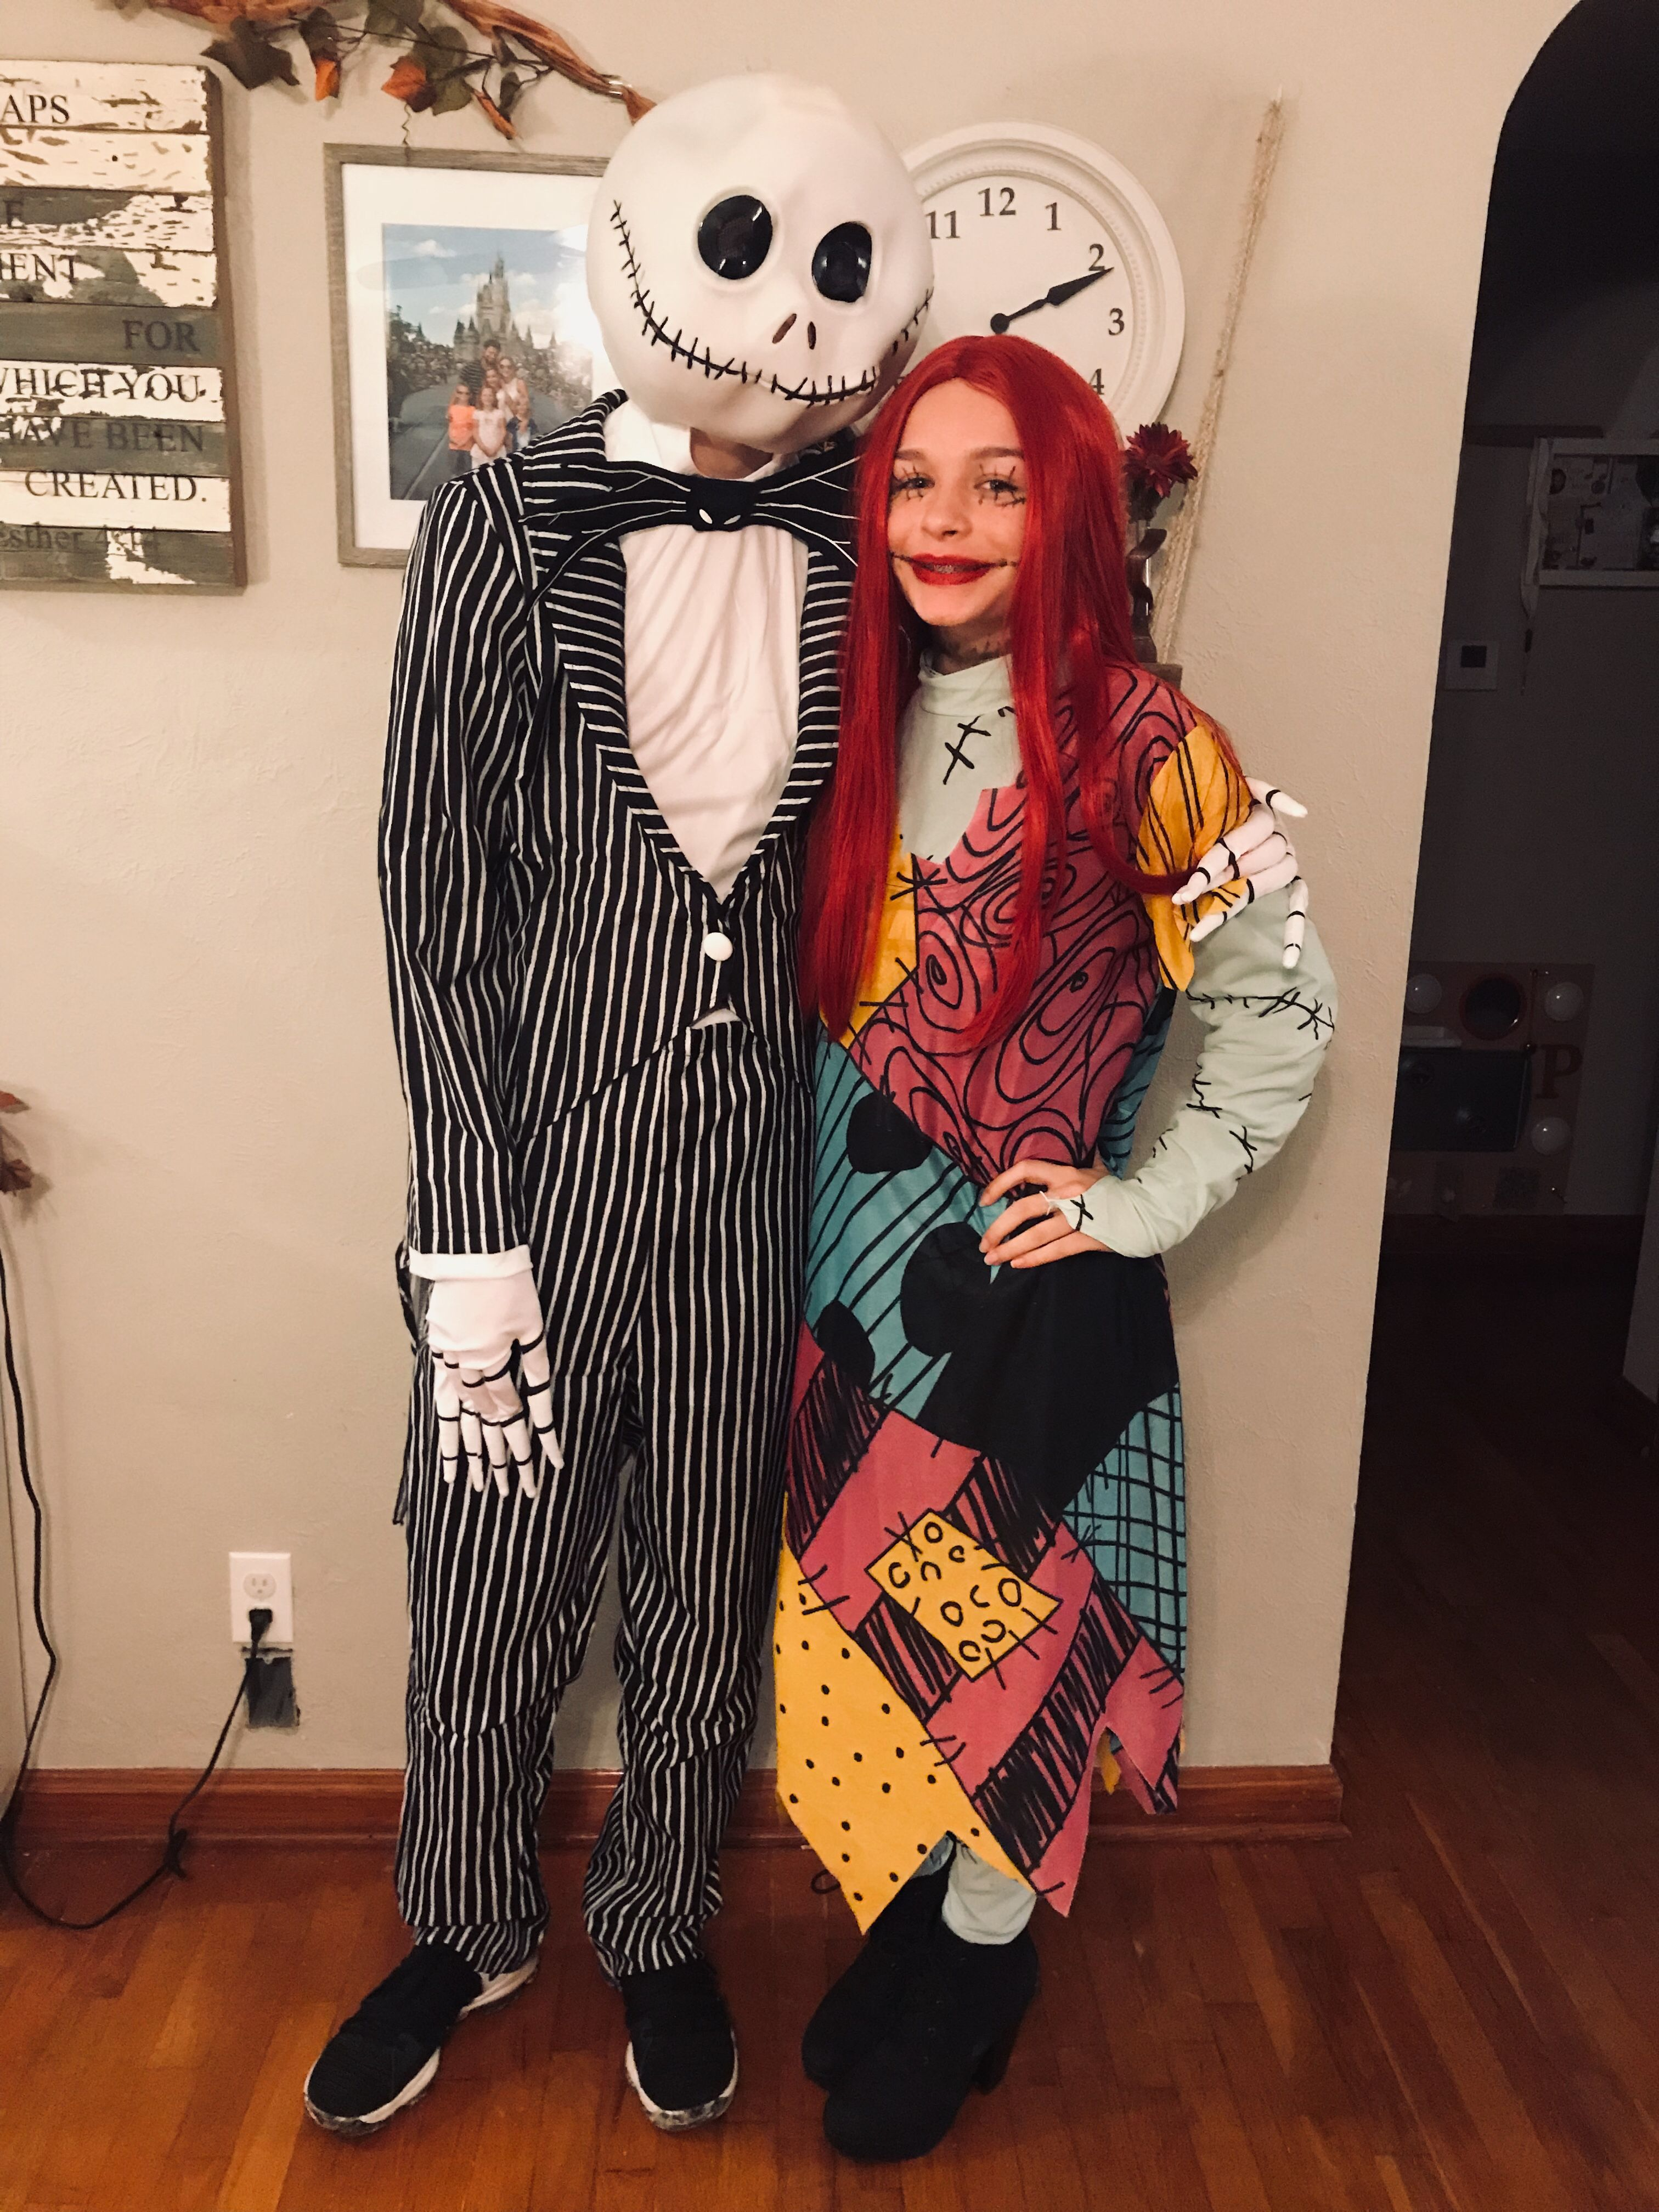 jack and sally nightmare before christmas couples costume #halloween